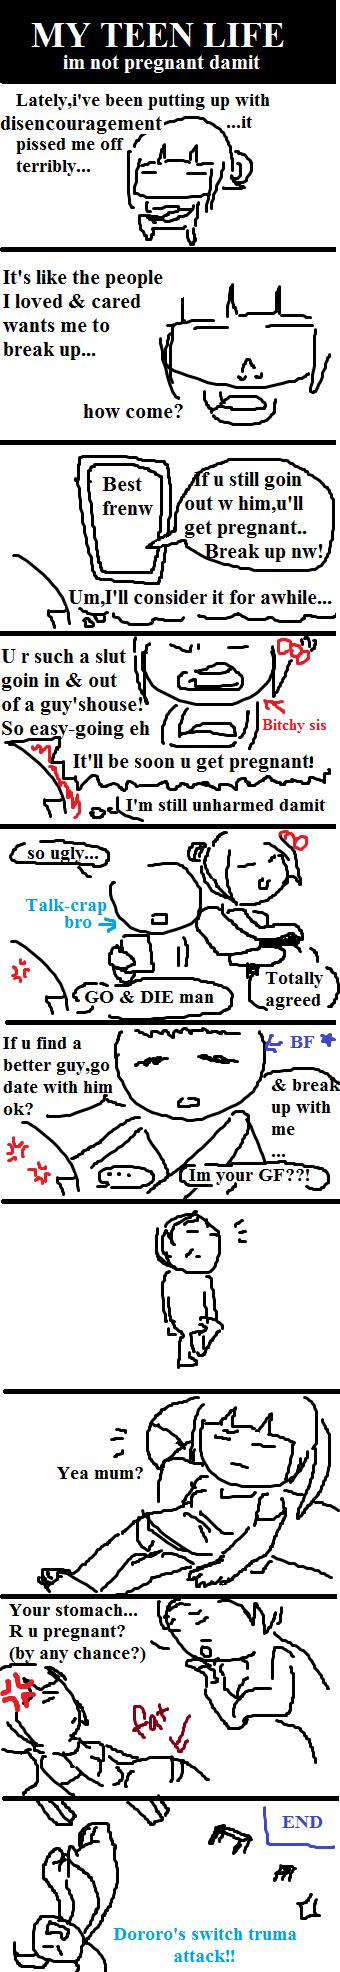 My Teen Life Meme1-I'm not preggo by skemo-cindy